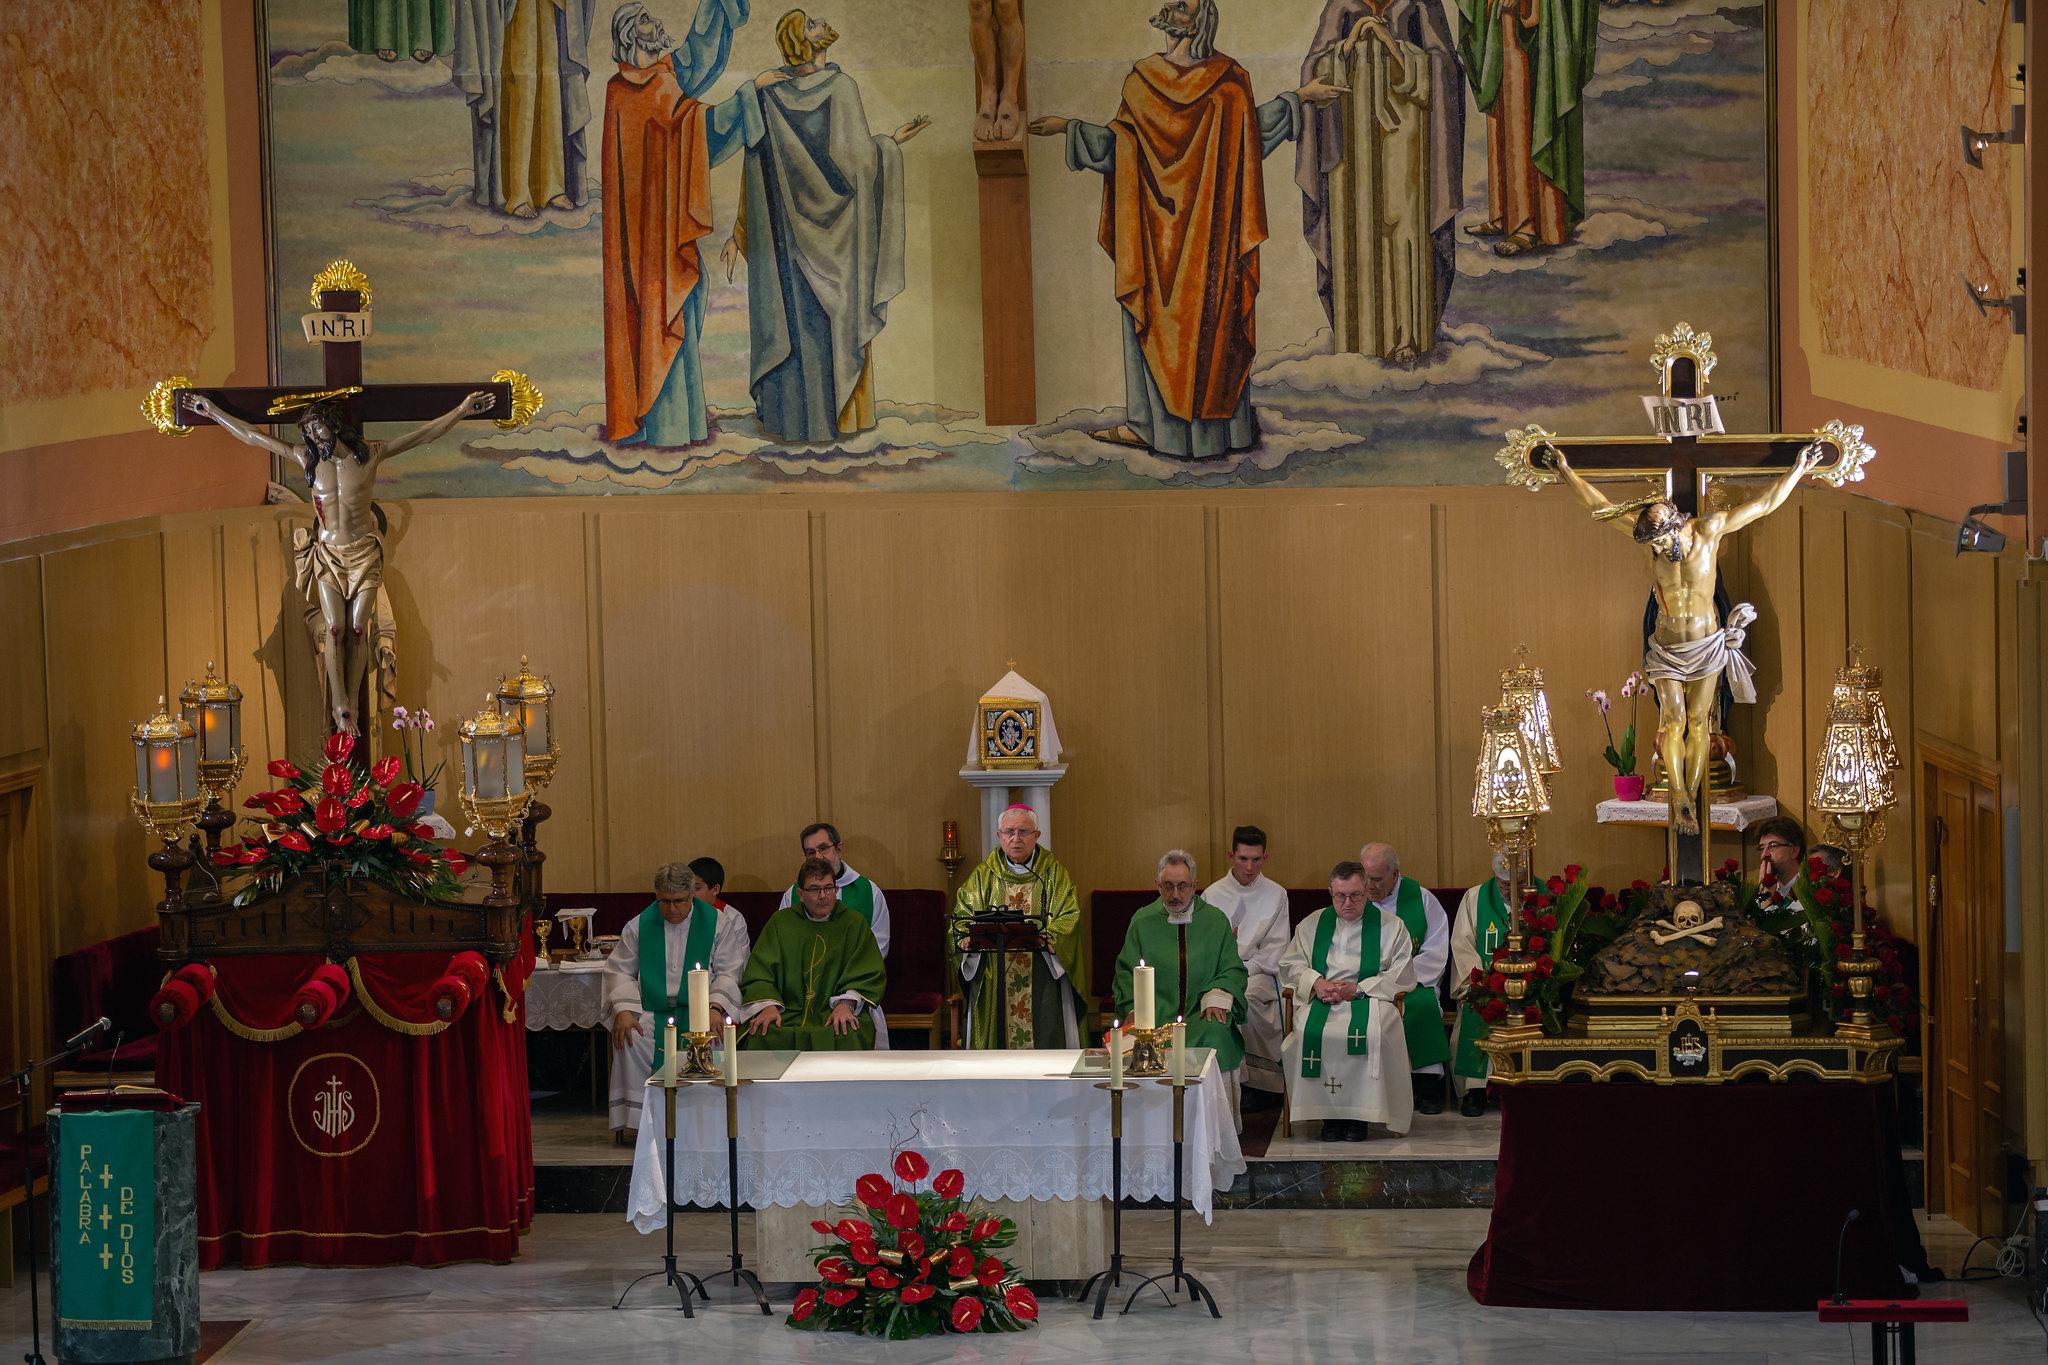 (2018-06-17) - 75 Aniversario - Encuentro - Vicent Olmos Navarro (07)